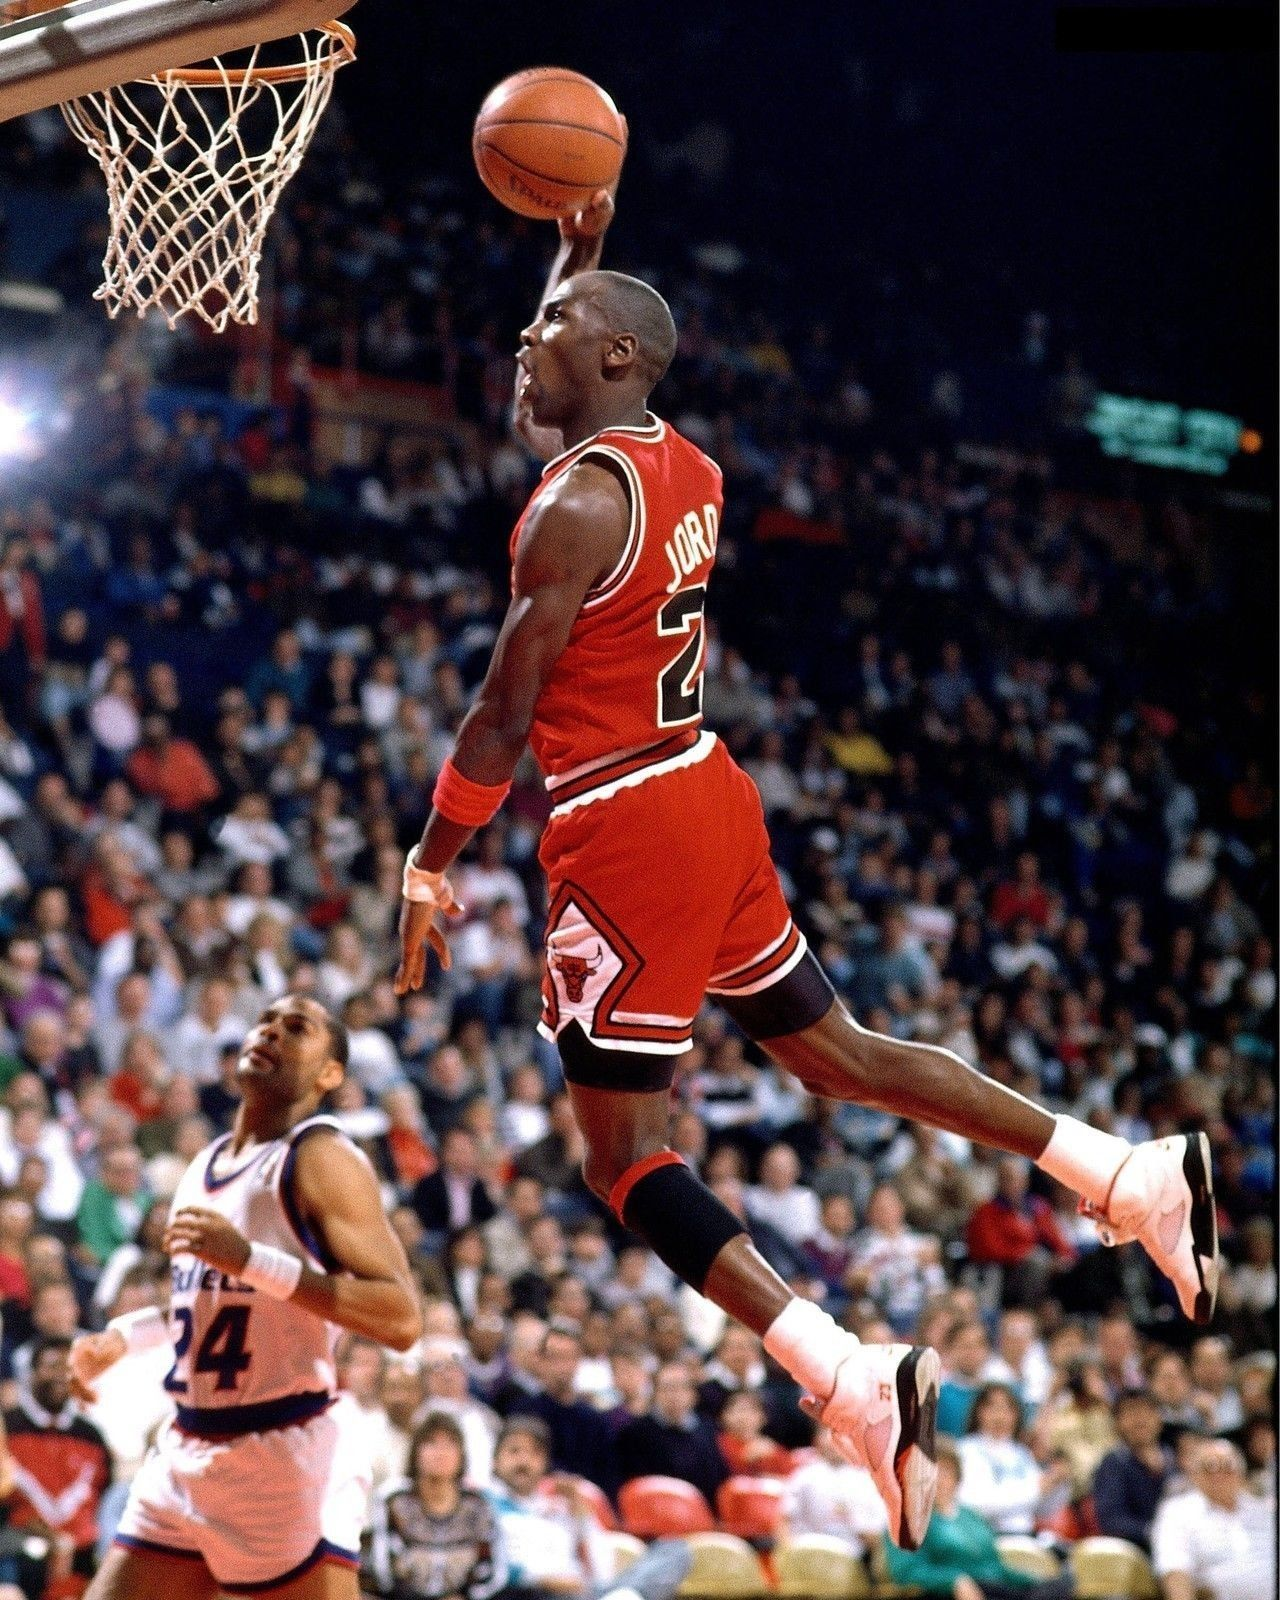 4.99 - Michael Jordan Nba Basketball Chicago Bulls Air Dunk 8X10 Sports  Photo Picture  ebay  Collectibles 7245ff9fe